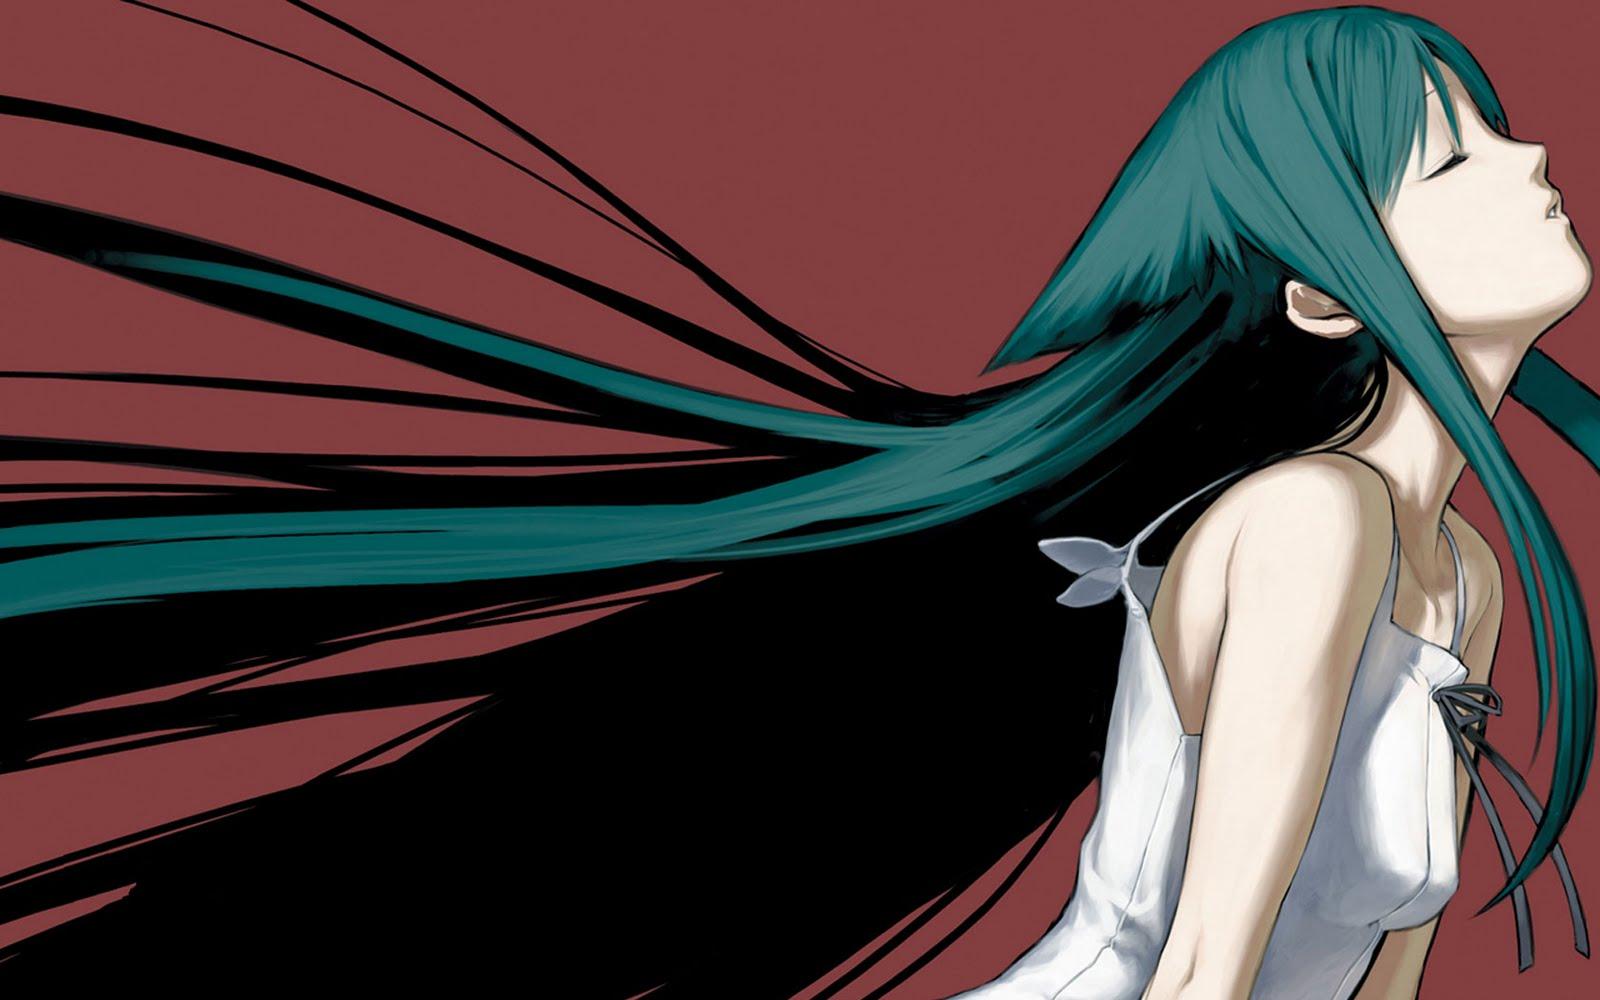 http://4.bp.blogspot.com/_PrVyyEai7-w/TQSycmn7r0I/AAAAAAAAAJM/ZcGosOLEfl8/s1600/anime%2Bwallpaper6.jpg